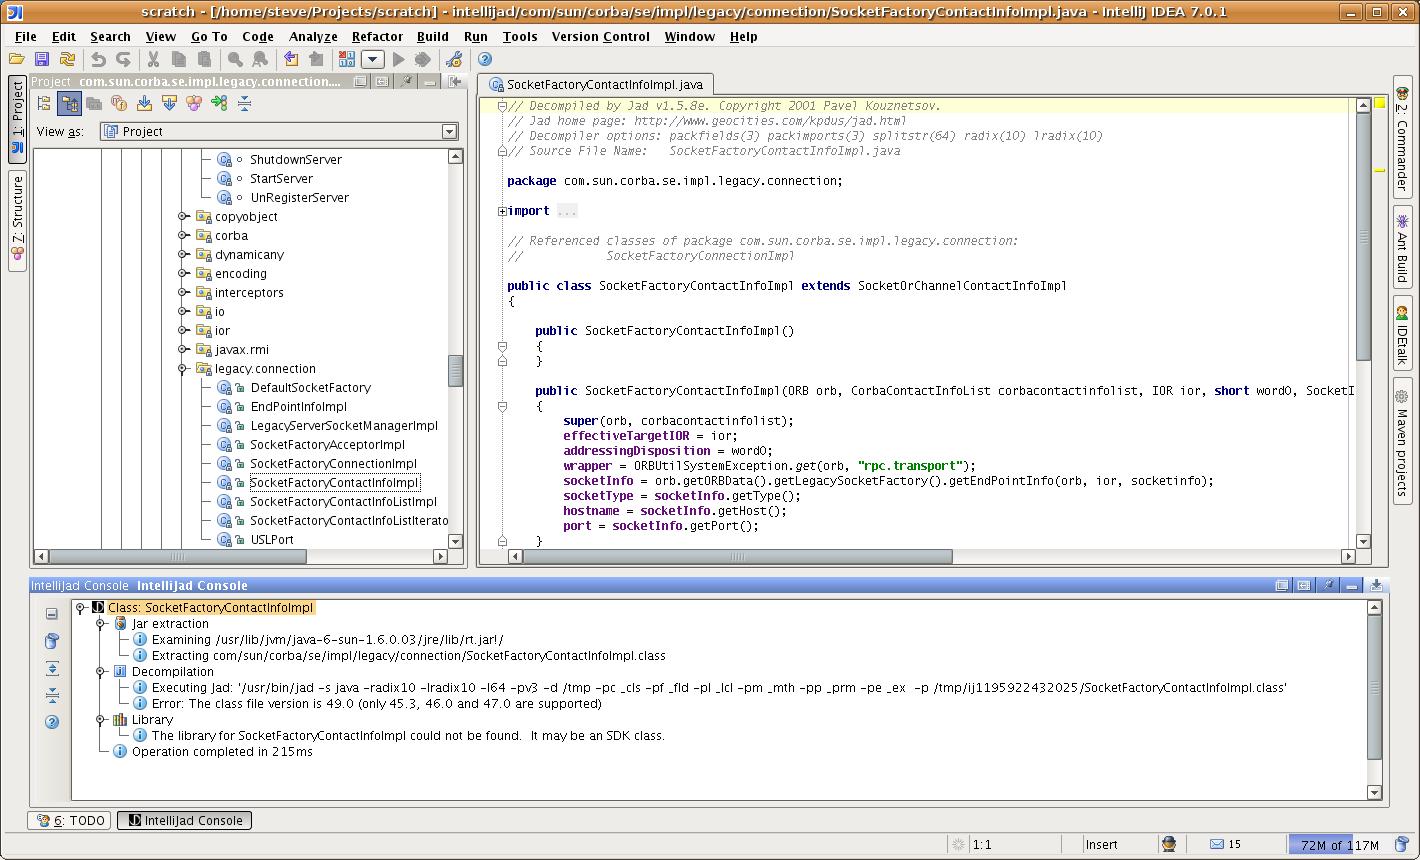 Screenshot #560